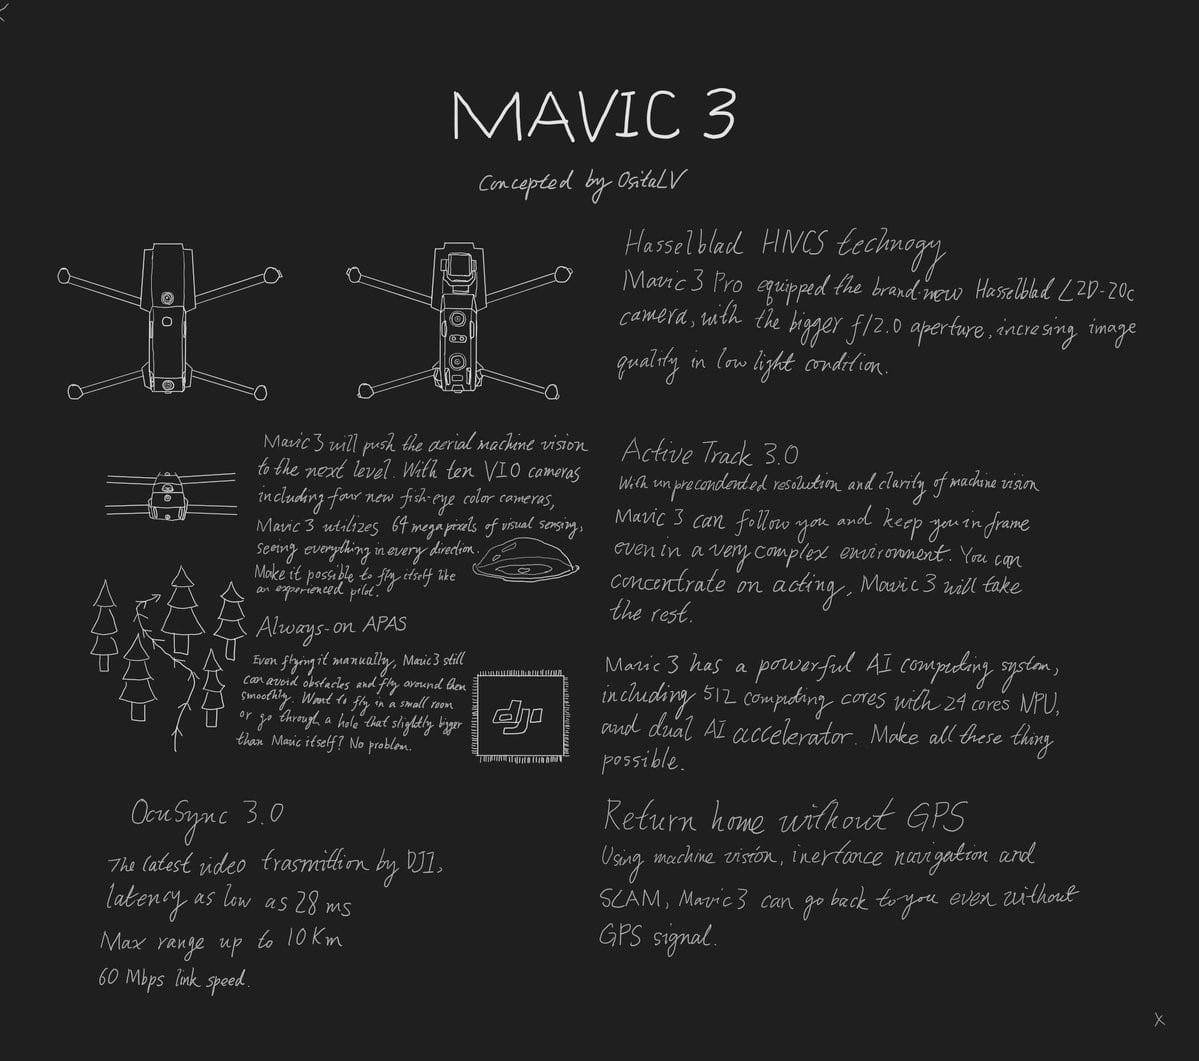 DJI Mavic 3